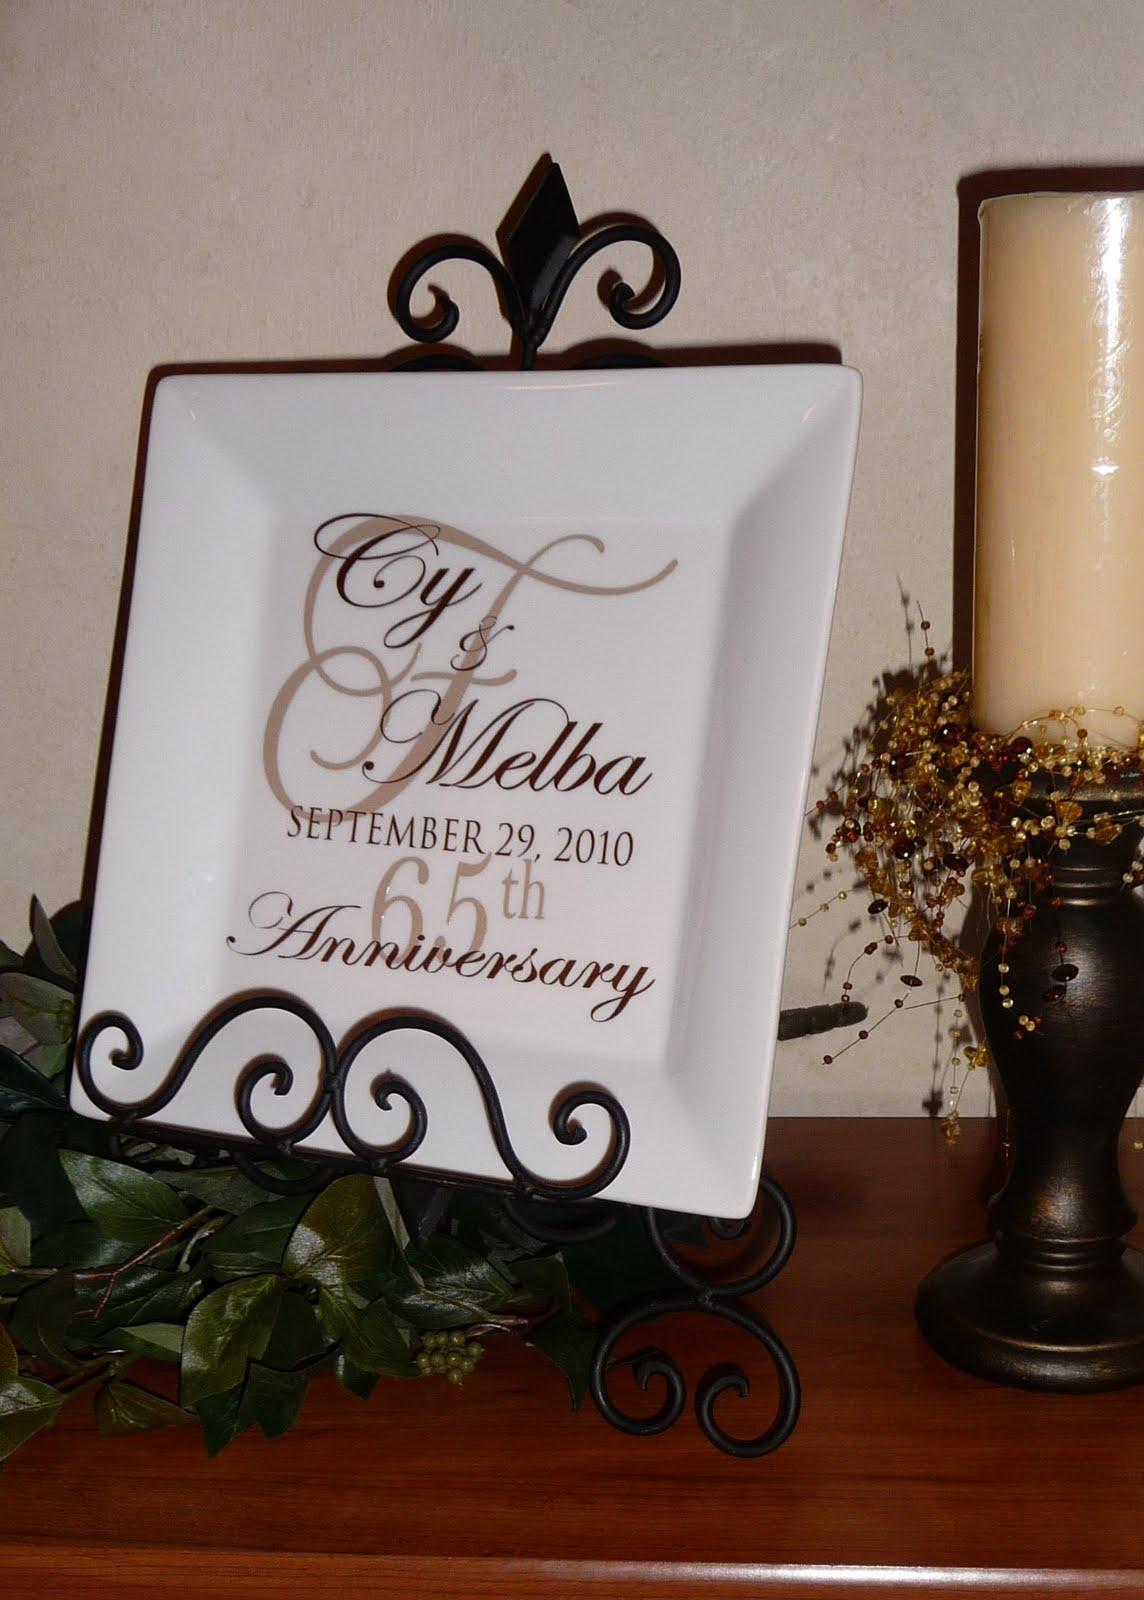 http://2.bp.blogspot.com/_w03Nz3Lac-s/TIvFaZ4_jUI/AAAAAAAADsU/rg7feHFX6ls/s1600/Anniversary+Plate.jpg